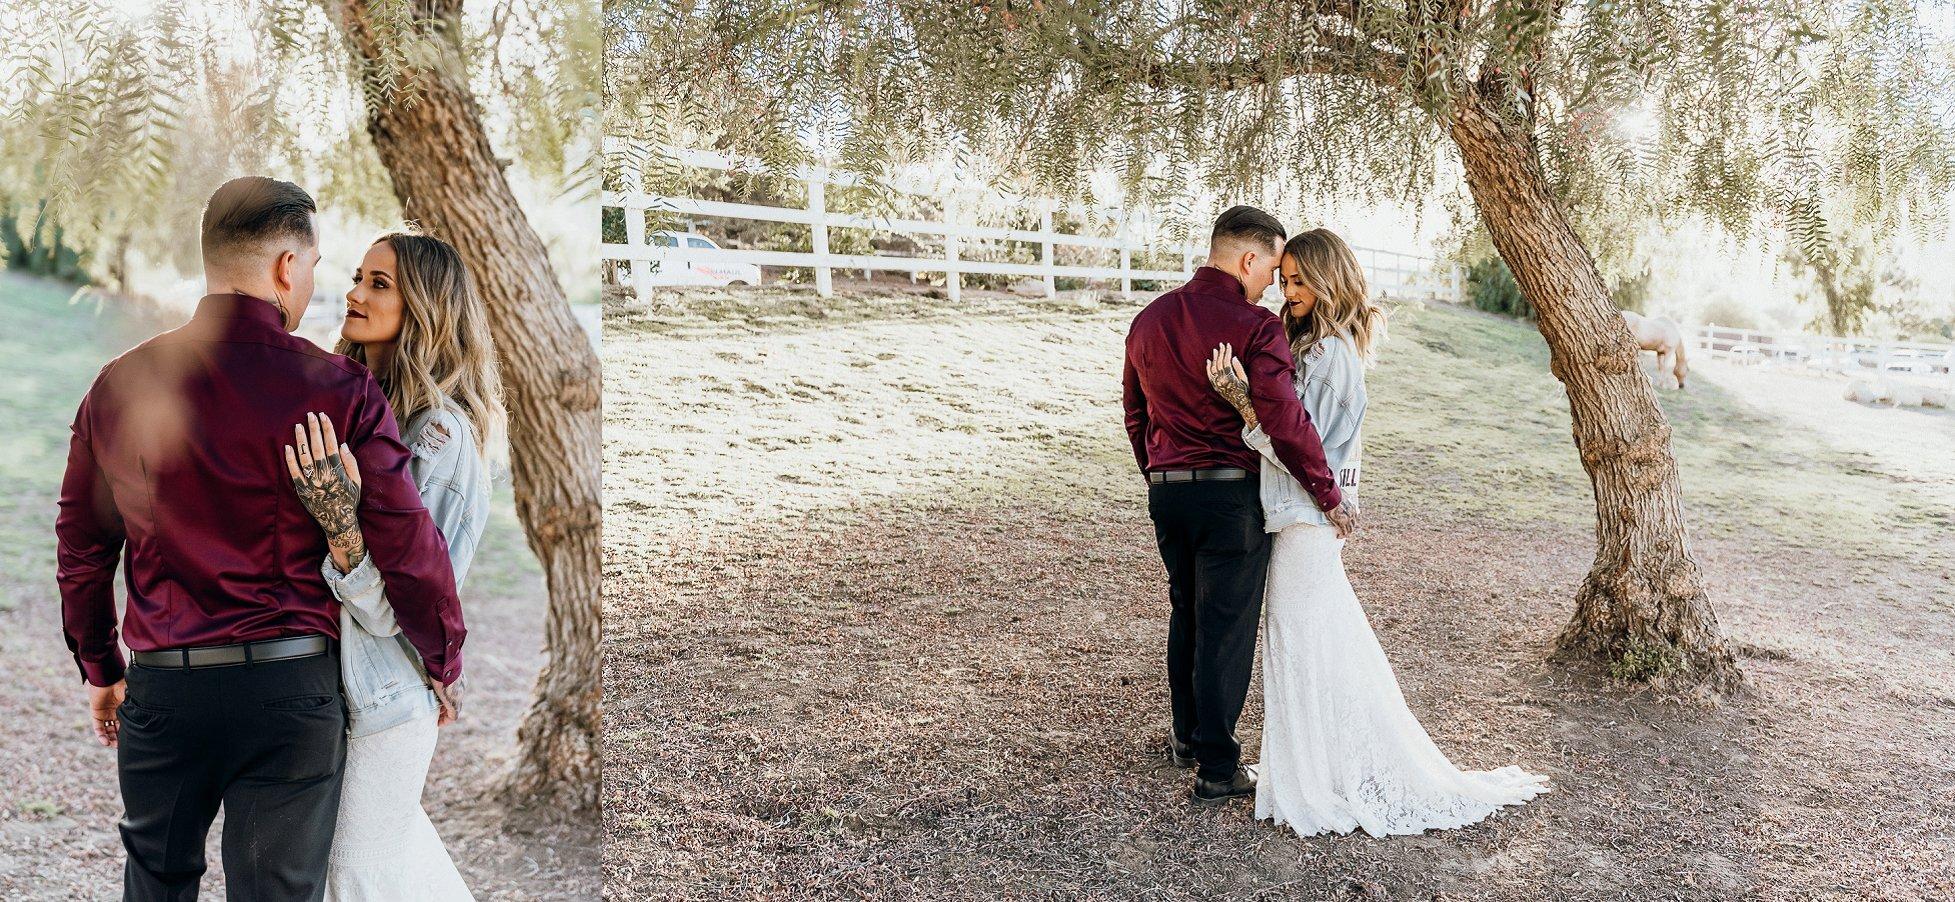 San Diego Wedding Photography La Bonita Ranch_0121.jpg